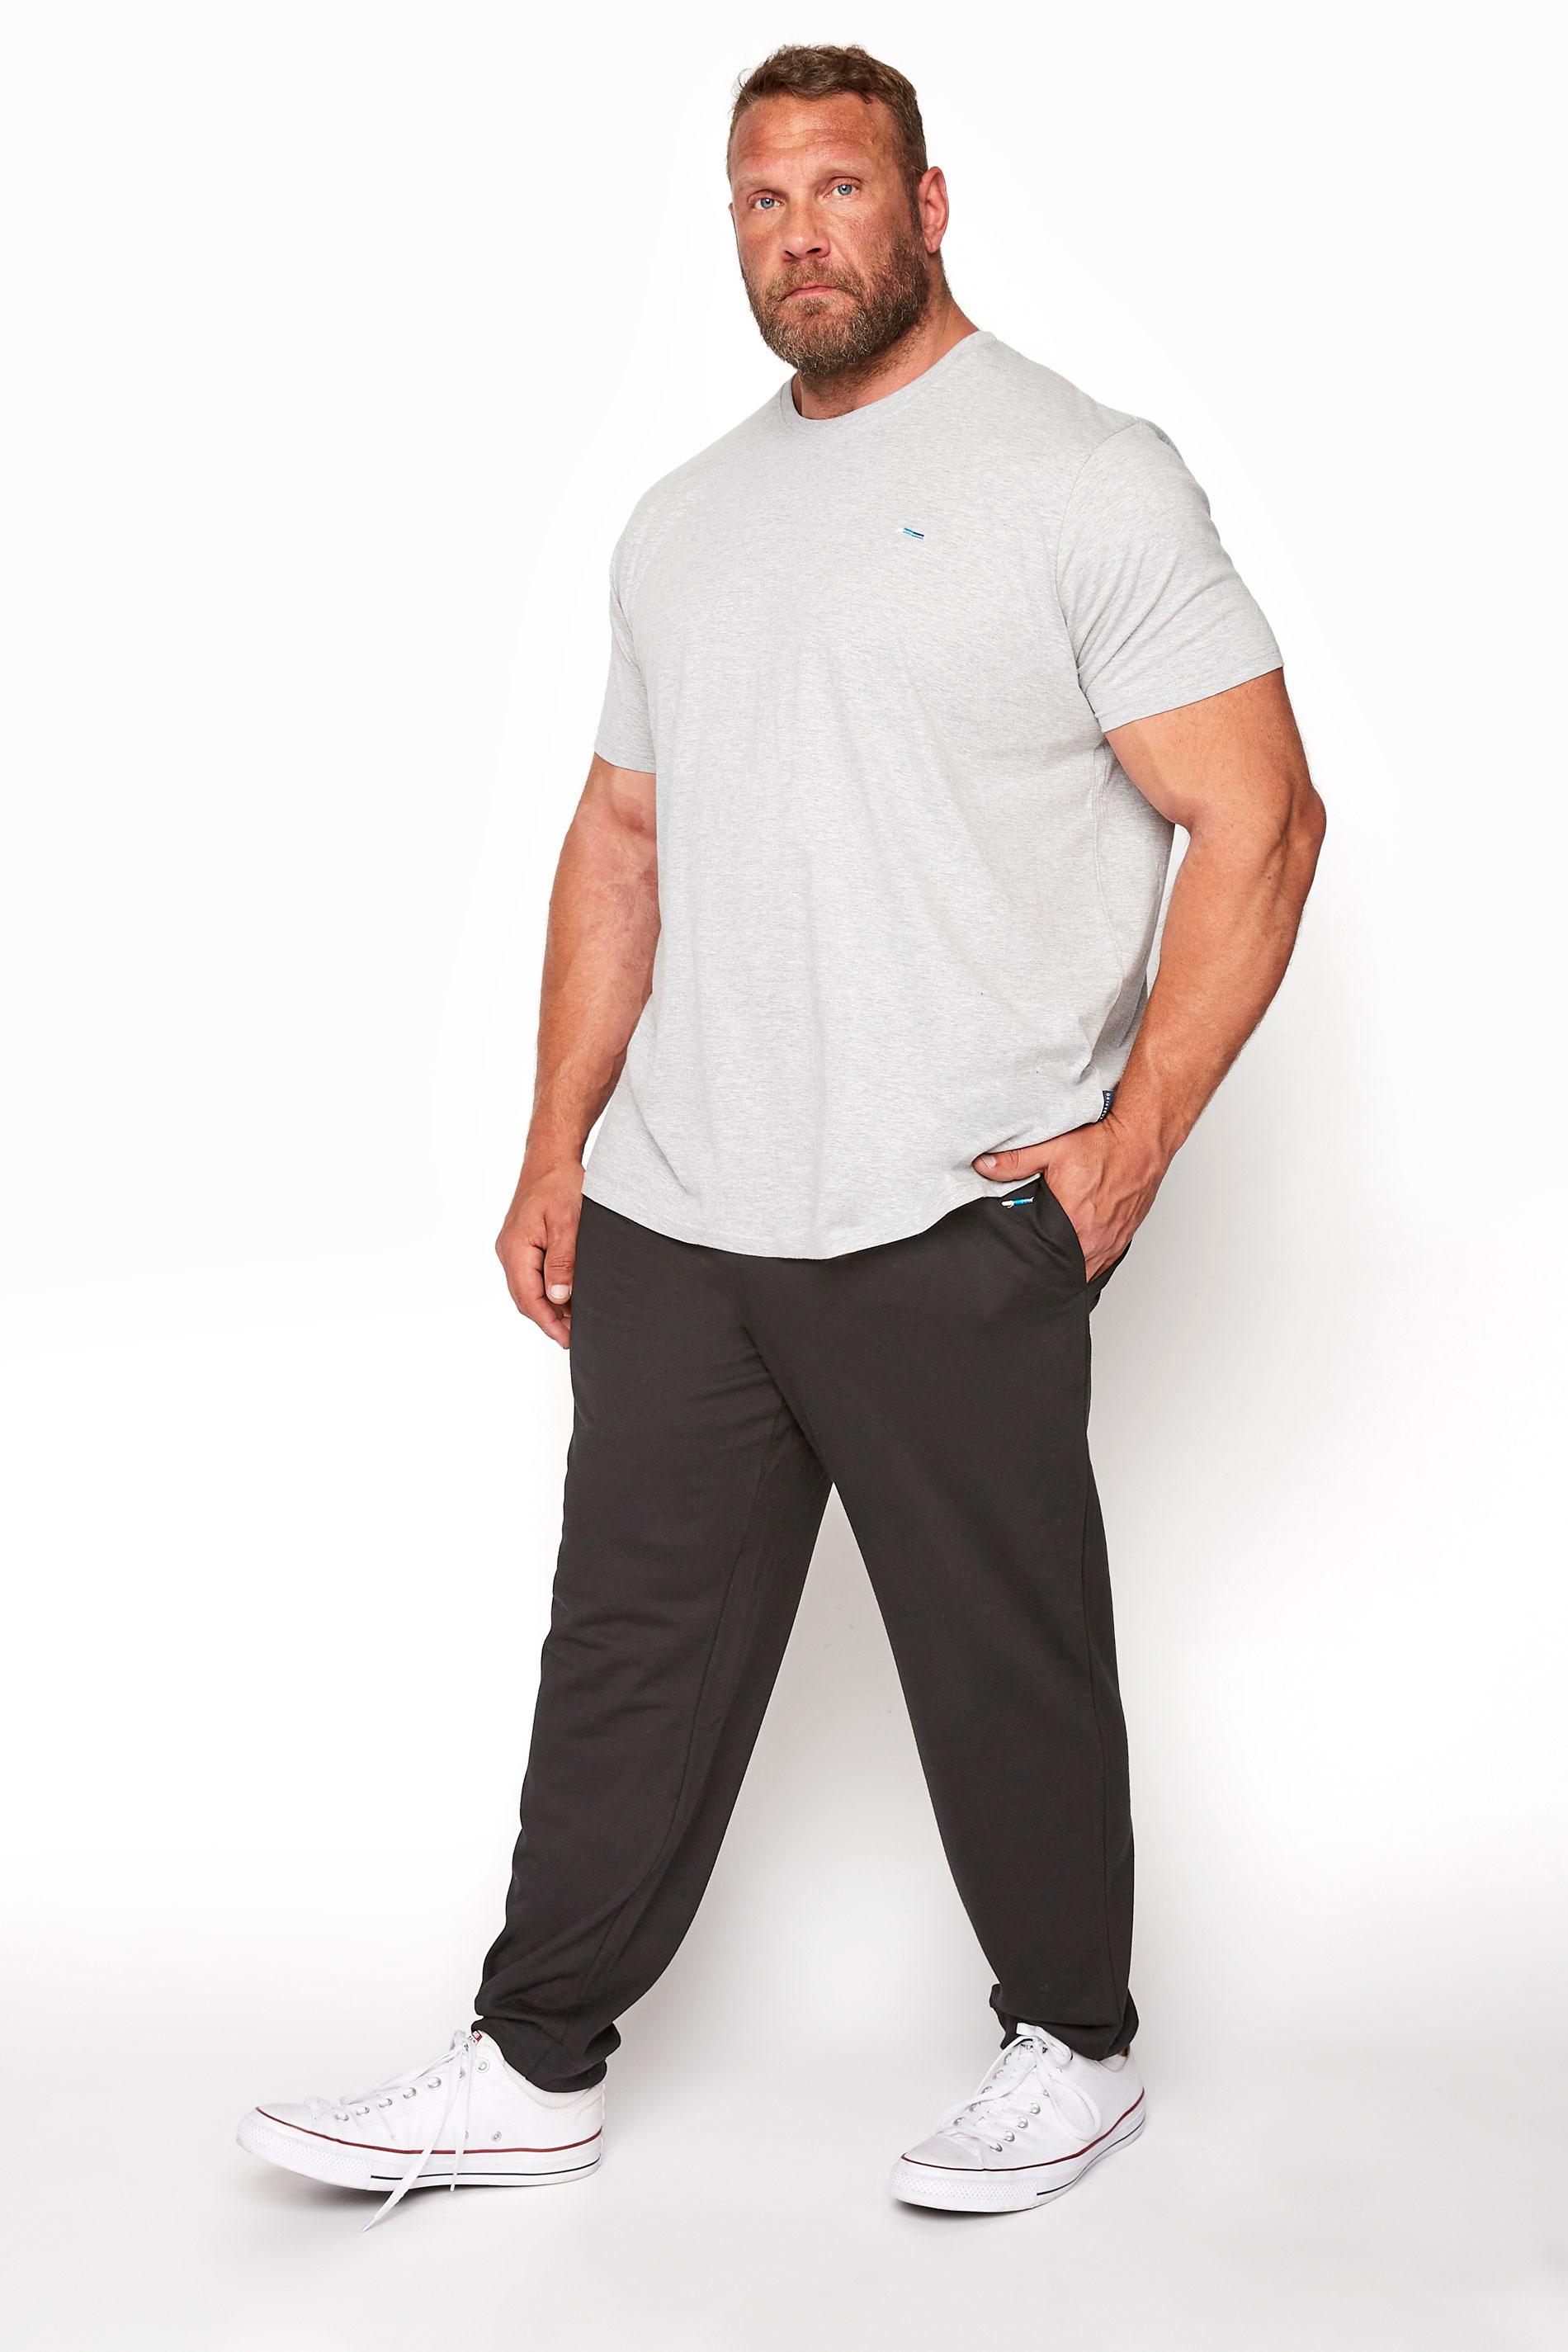 BadRhino Black Essential Joggers_A.jpg